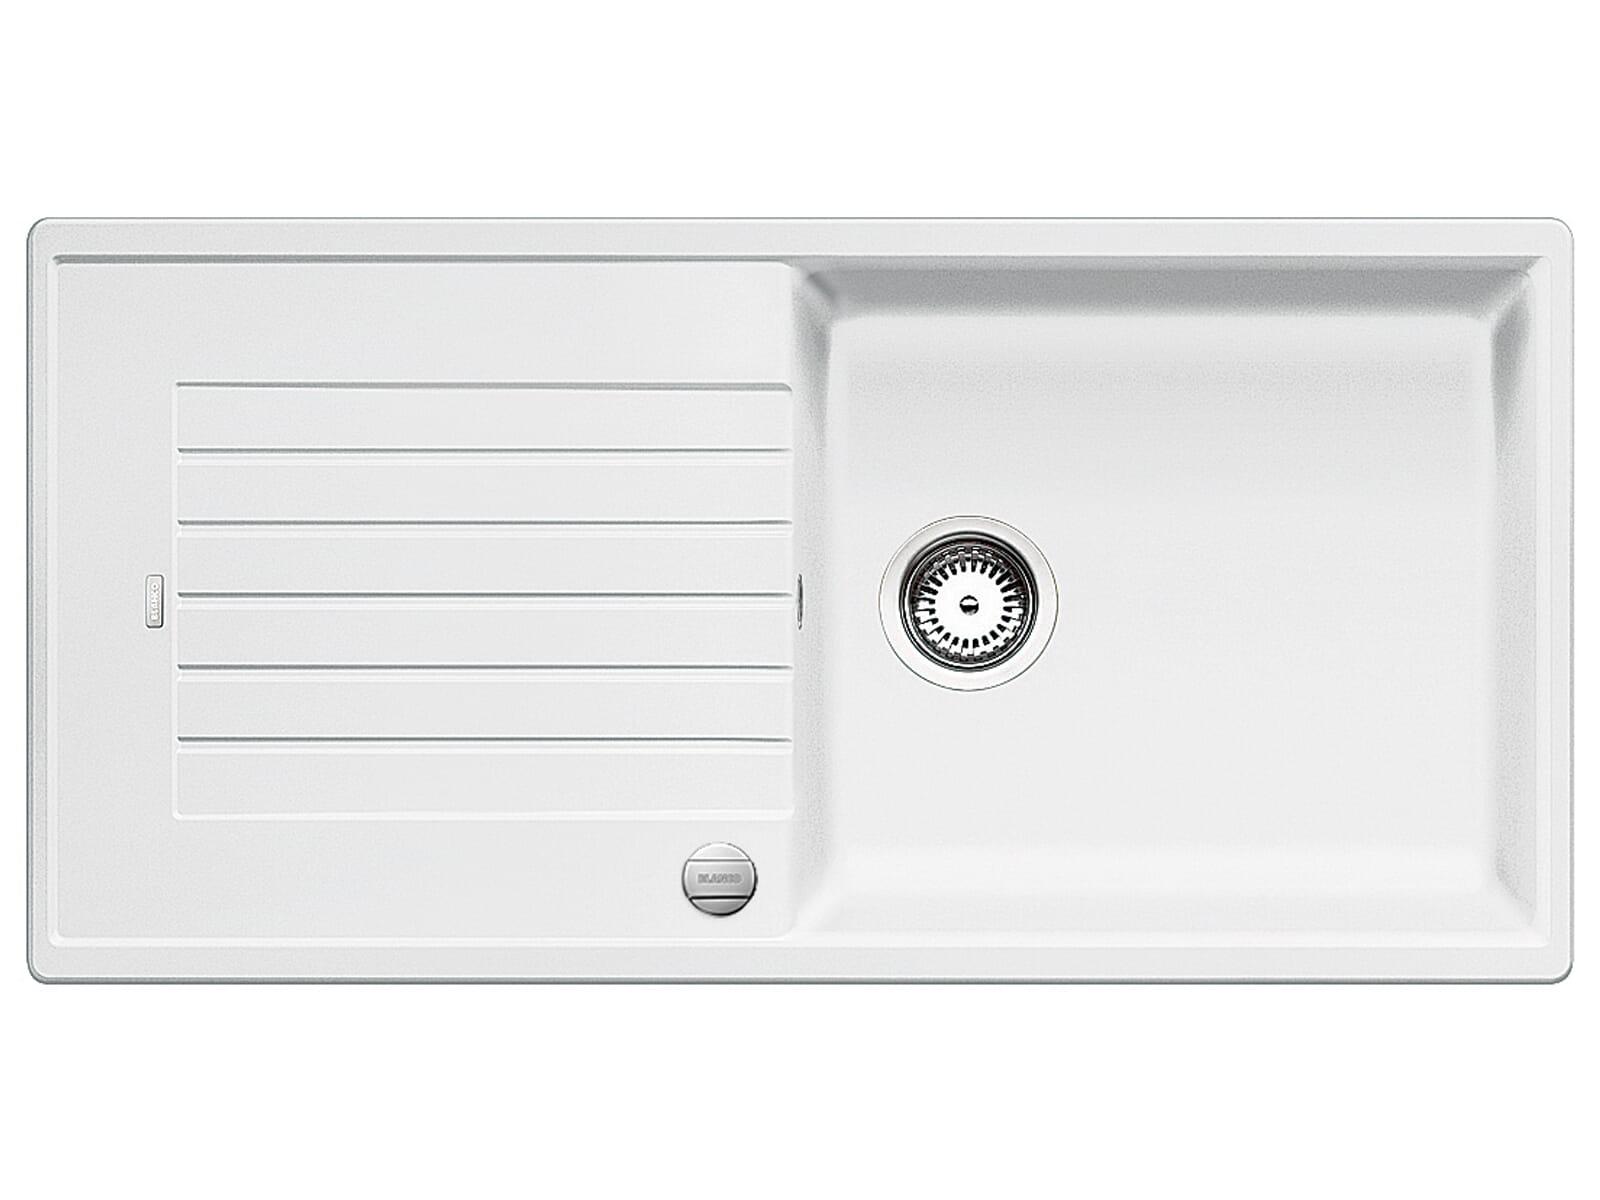 Blanco Zia XL 6 S Weiß - 517 561 Granitspüle